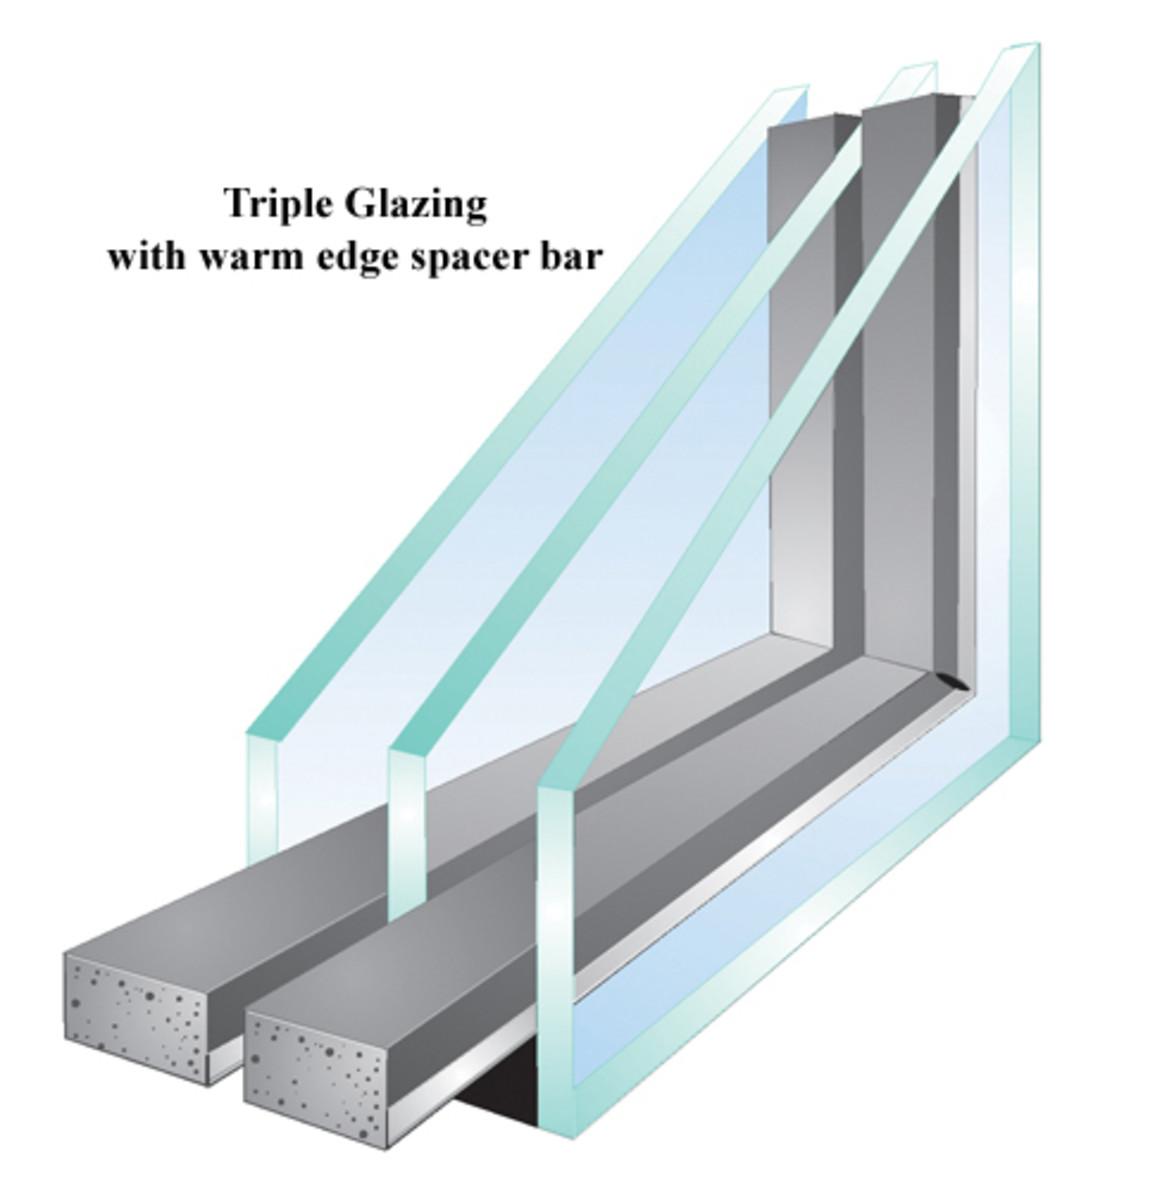 Triple Glazing with warm Edge Spacer Bar